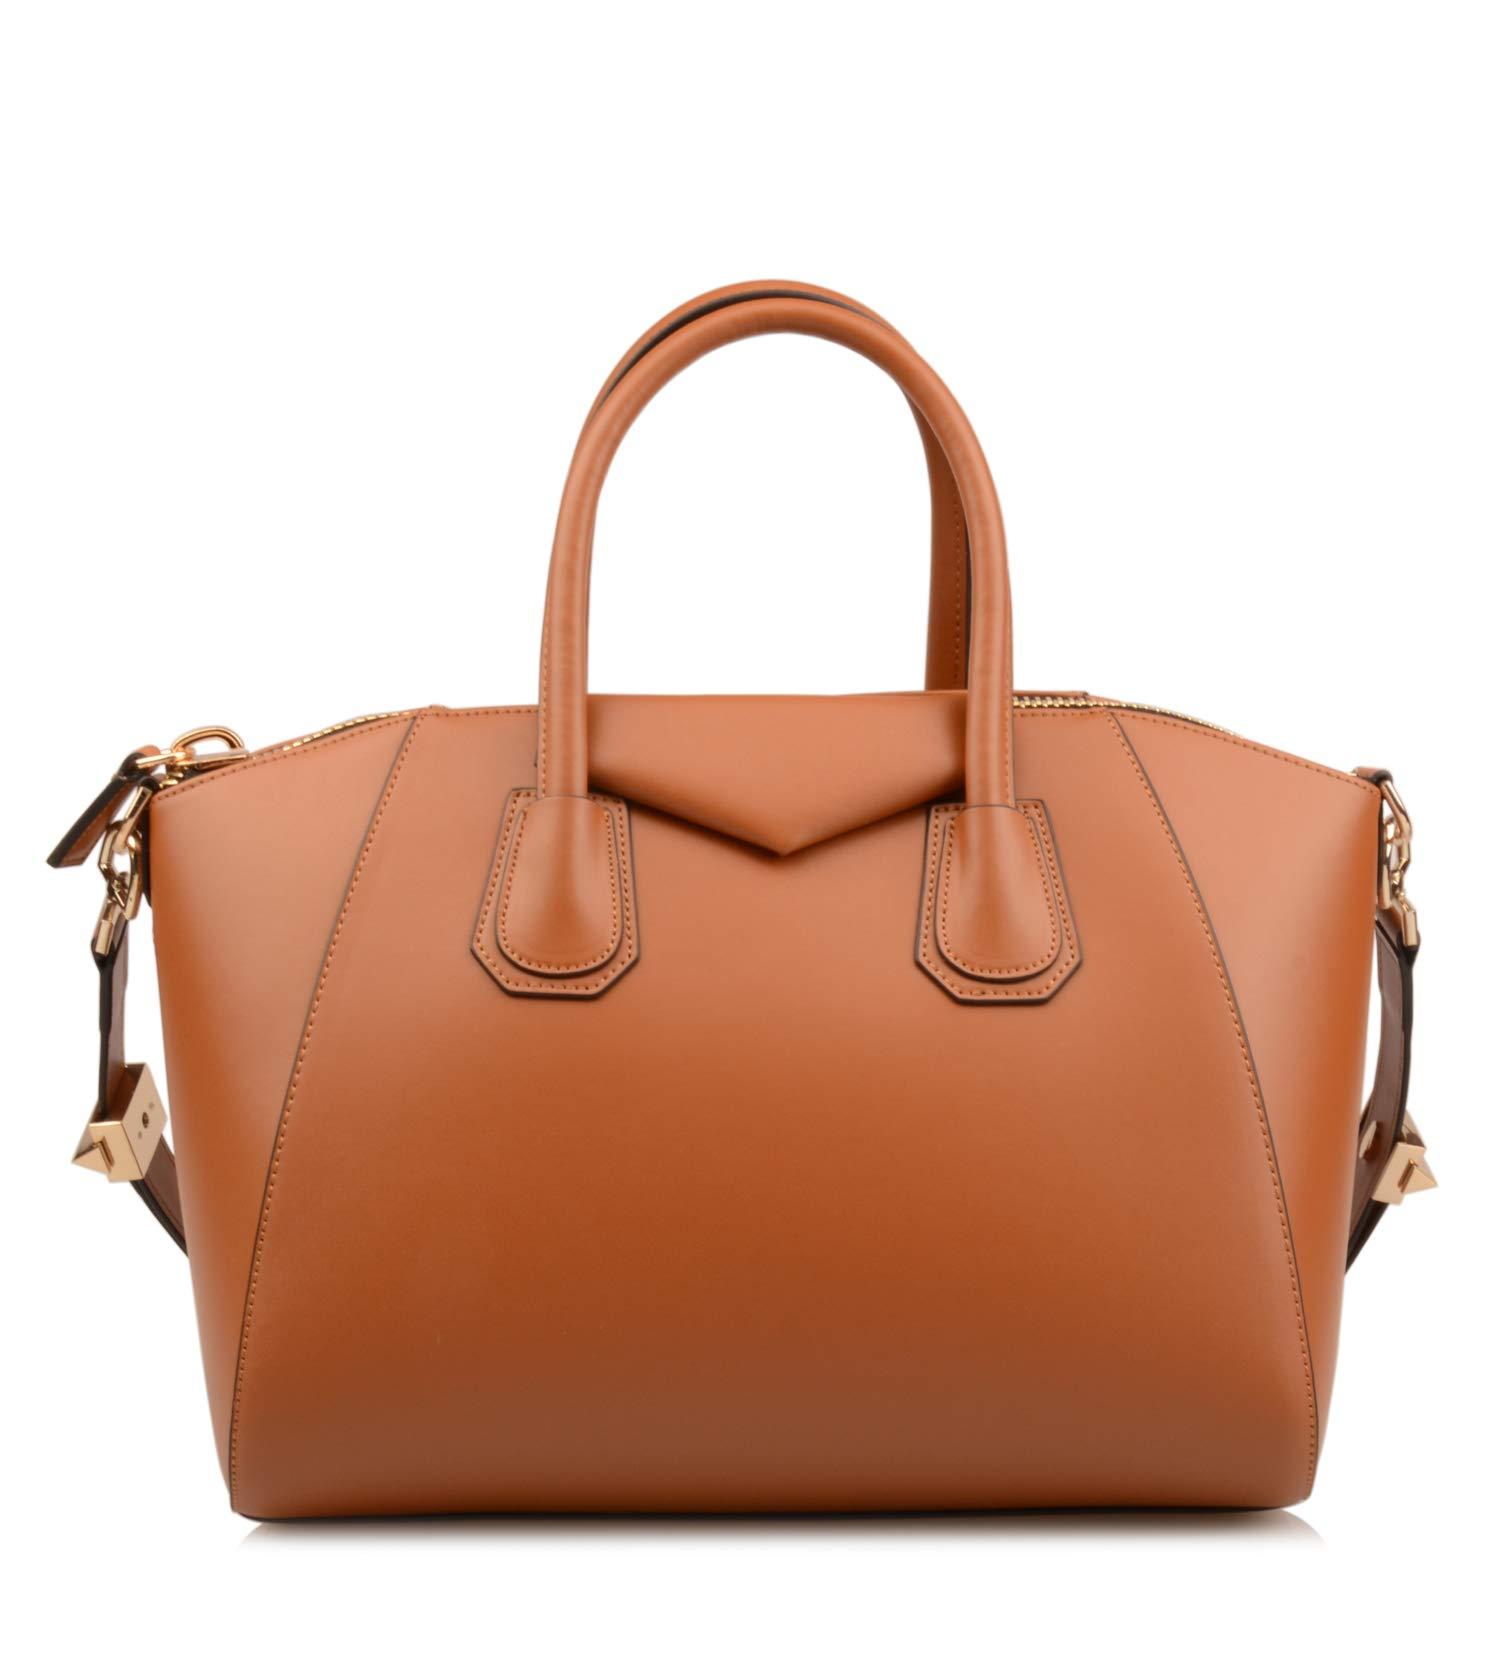 Ainifeel Women's Genuine Leather Simple Everyday Purse Top Handle Handbag Shoulder Handbags(Medium, Brown)